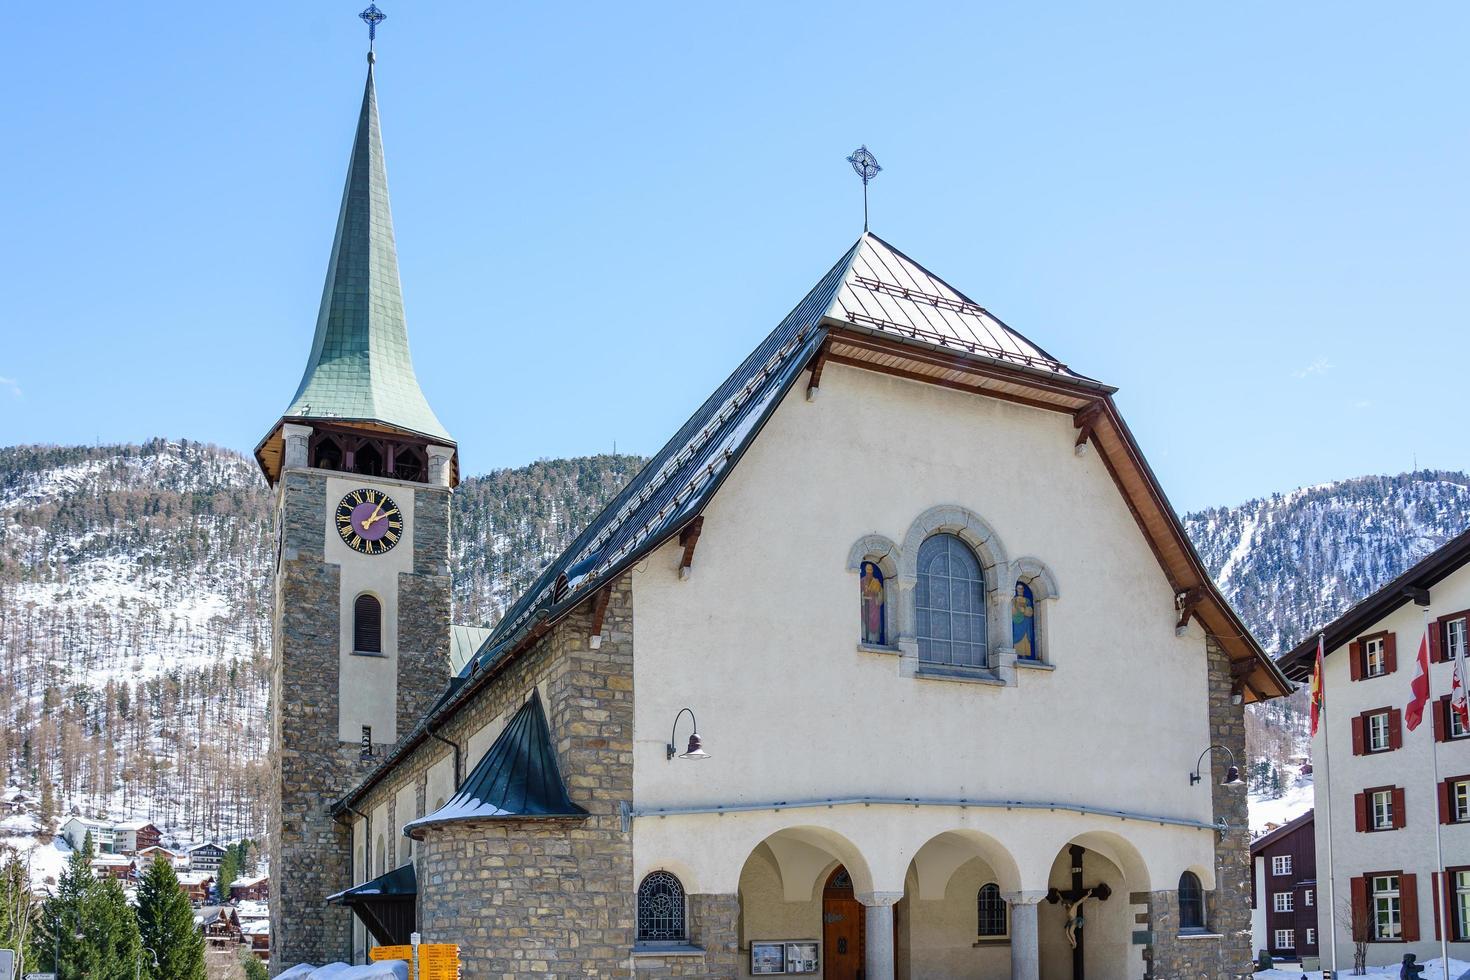 pfarrkirche st. mauritius a zermatt, svizzera foto